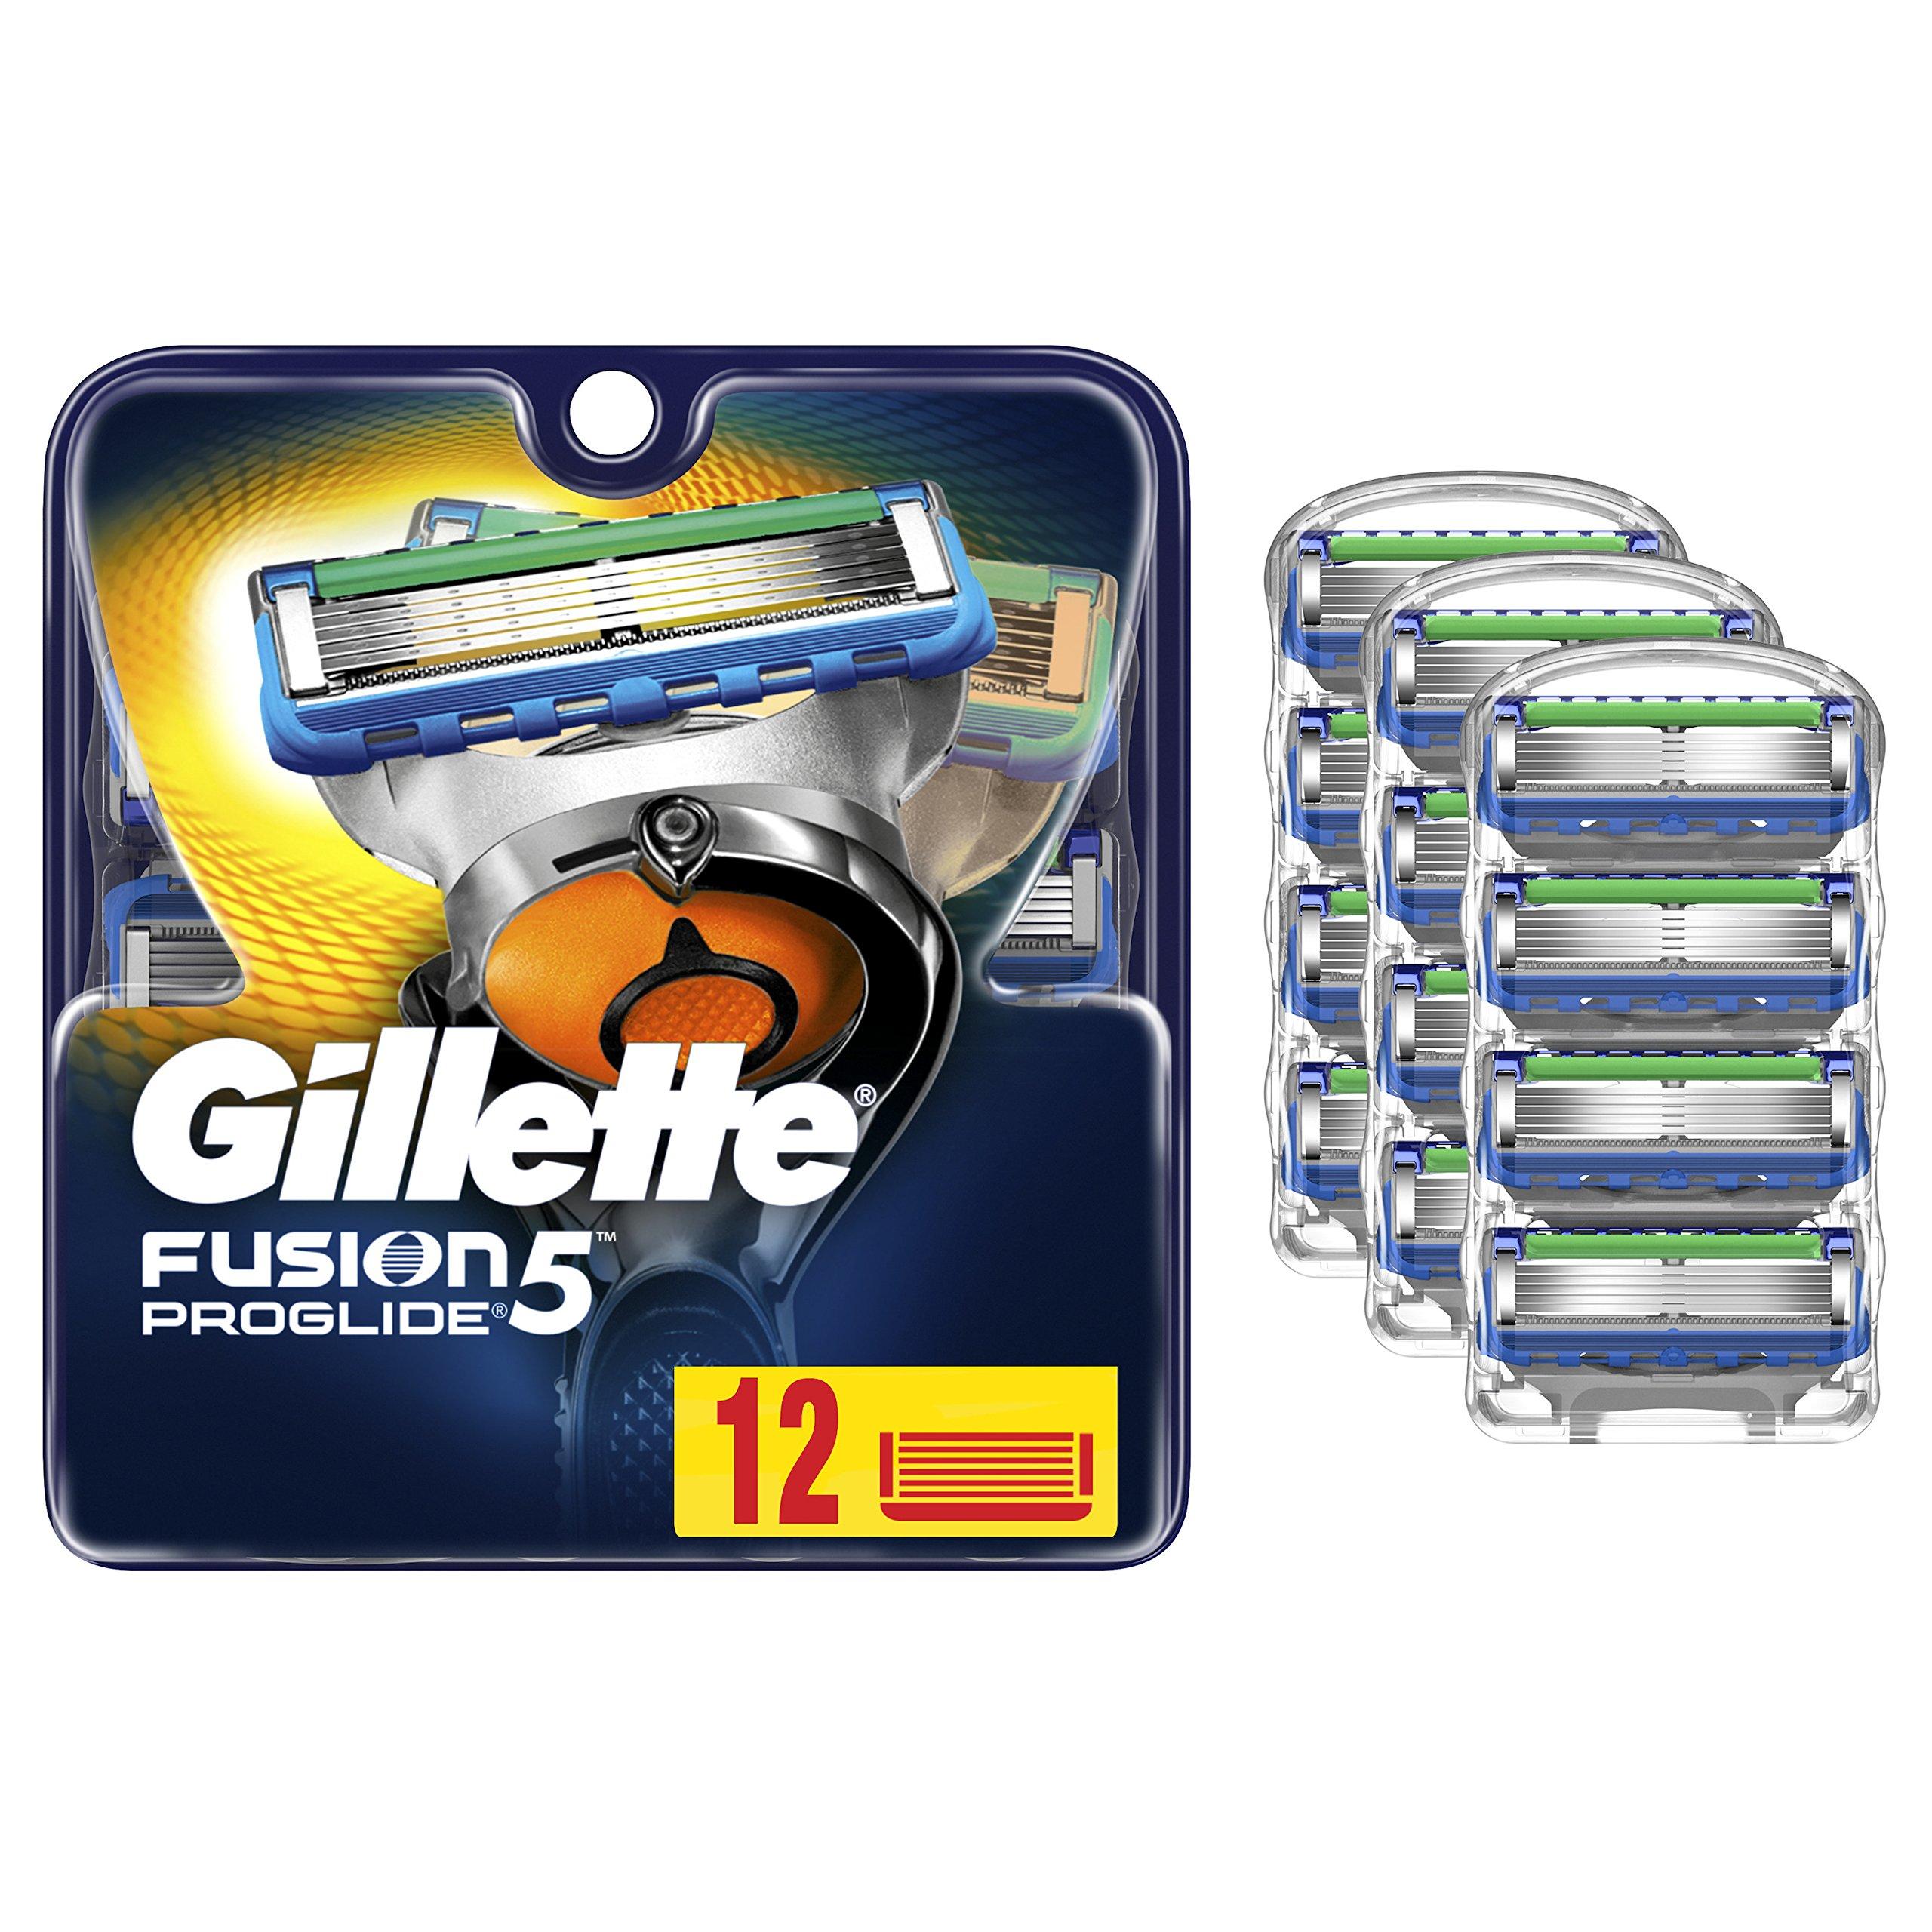 Gillette Fusion5 ProGlide Men's Razor Blades, 12 Blade Refills by Gillette (Image #7)